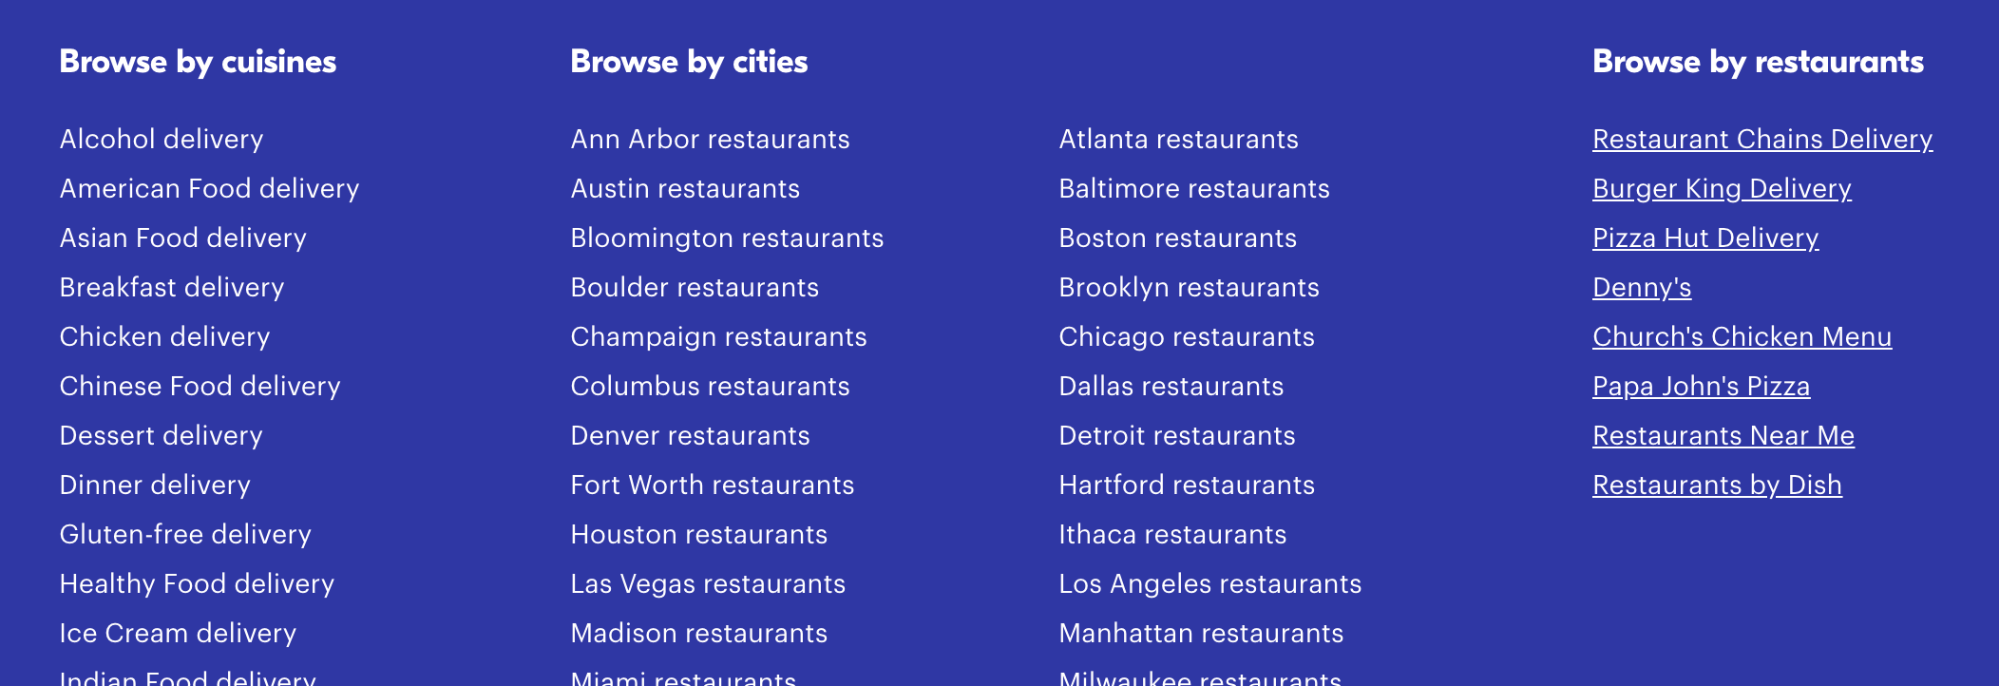 Footer menu example